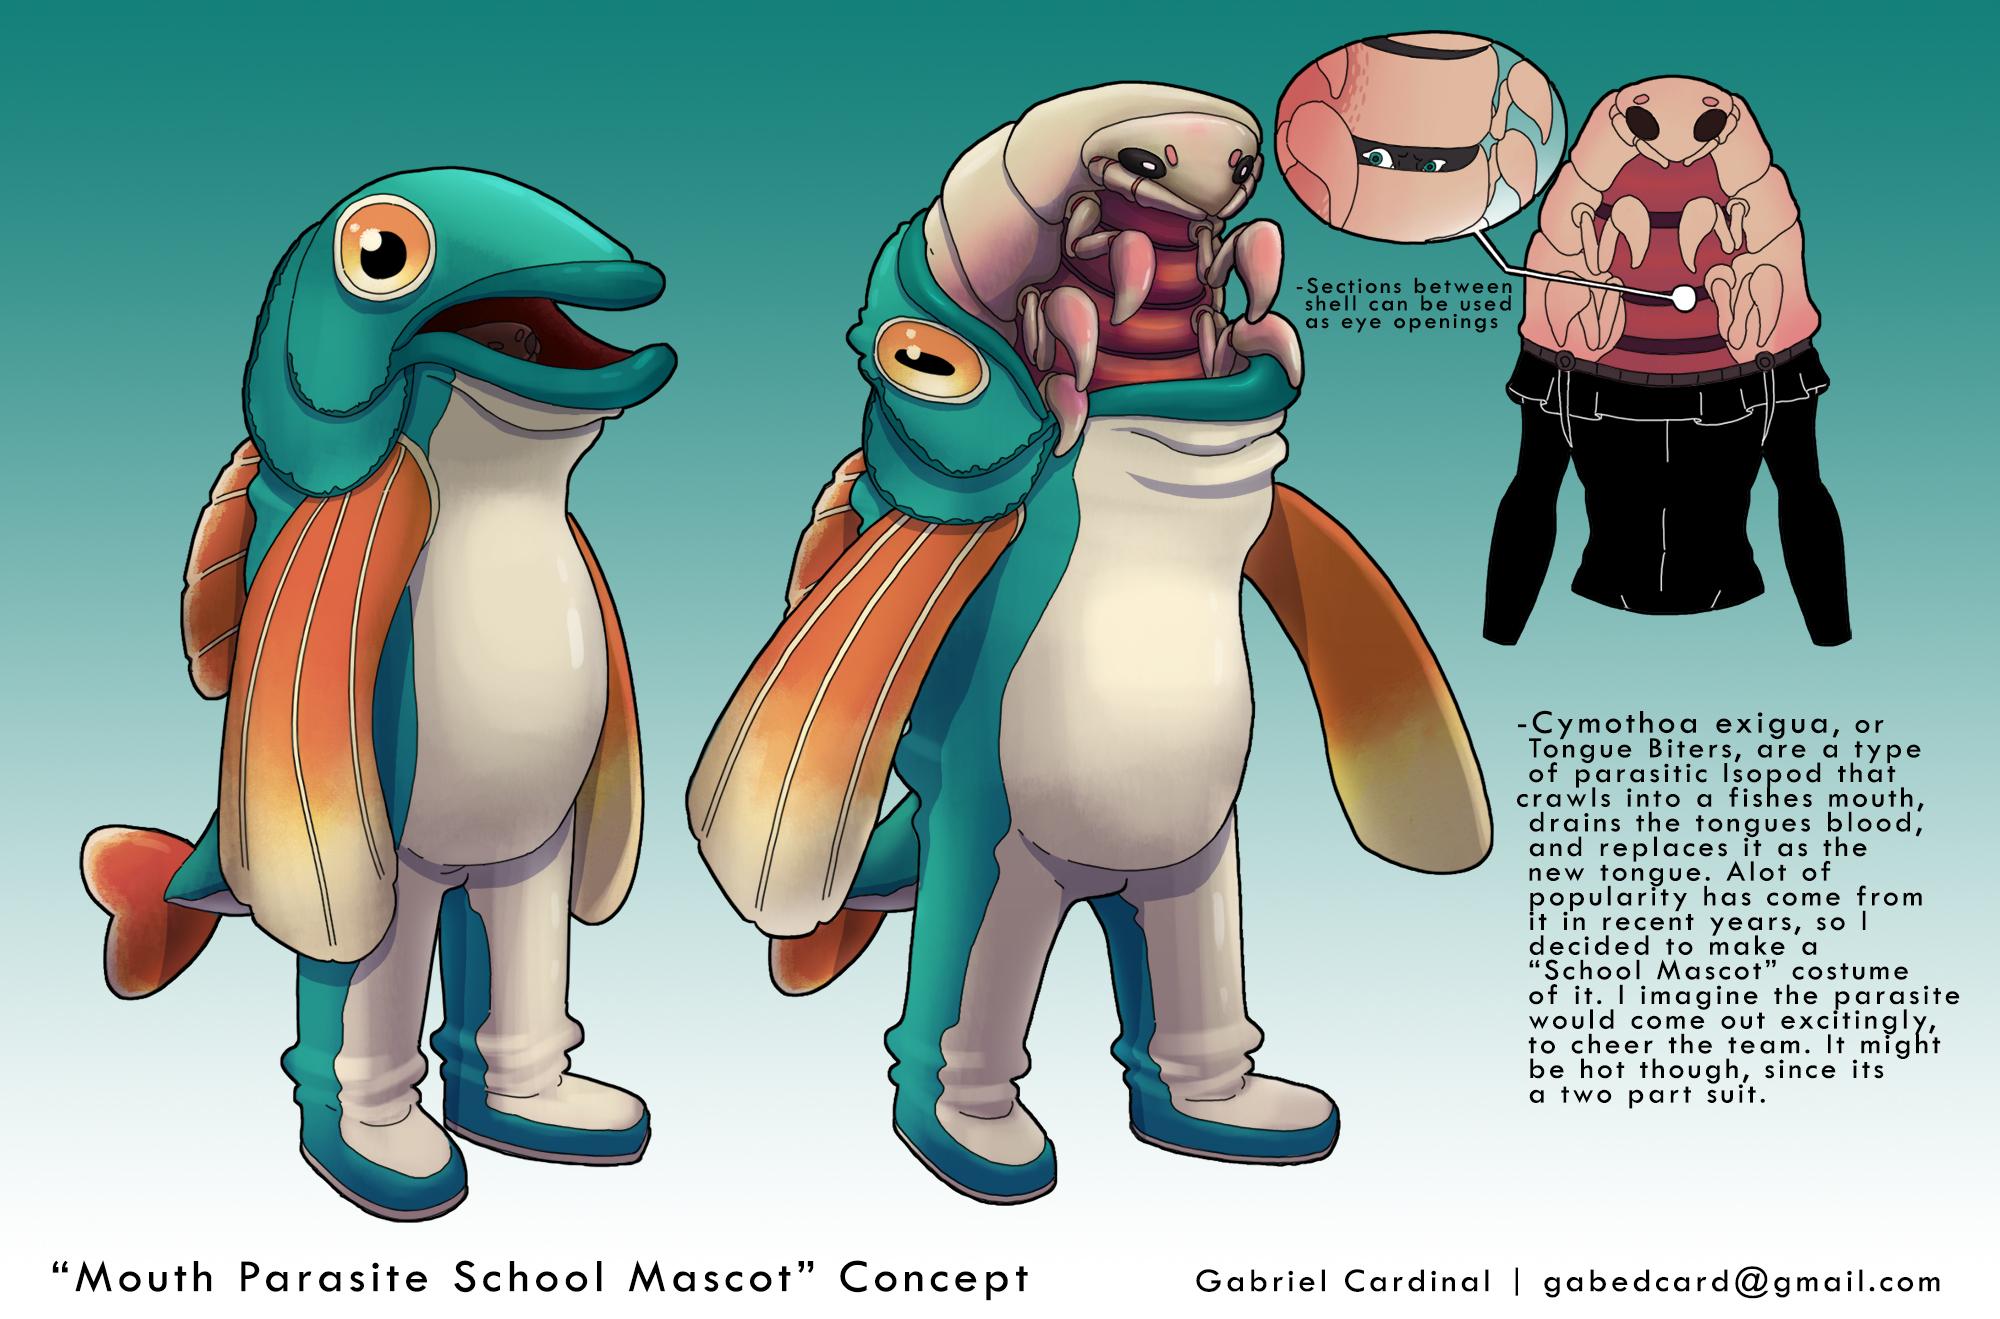 Parasite Mascot Concept